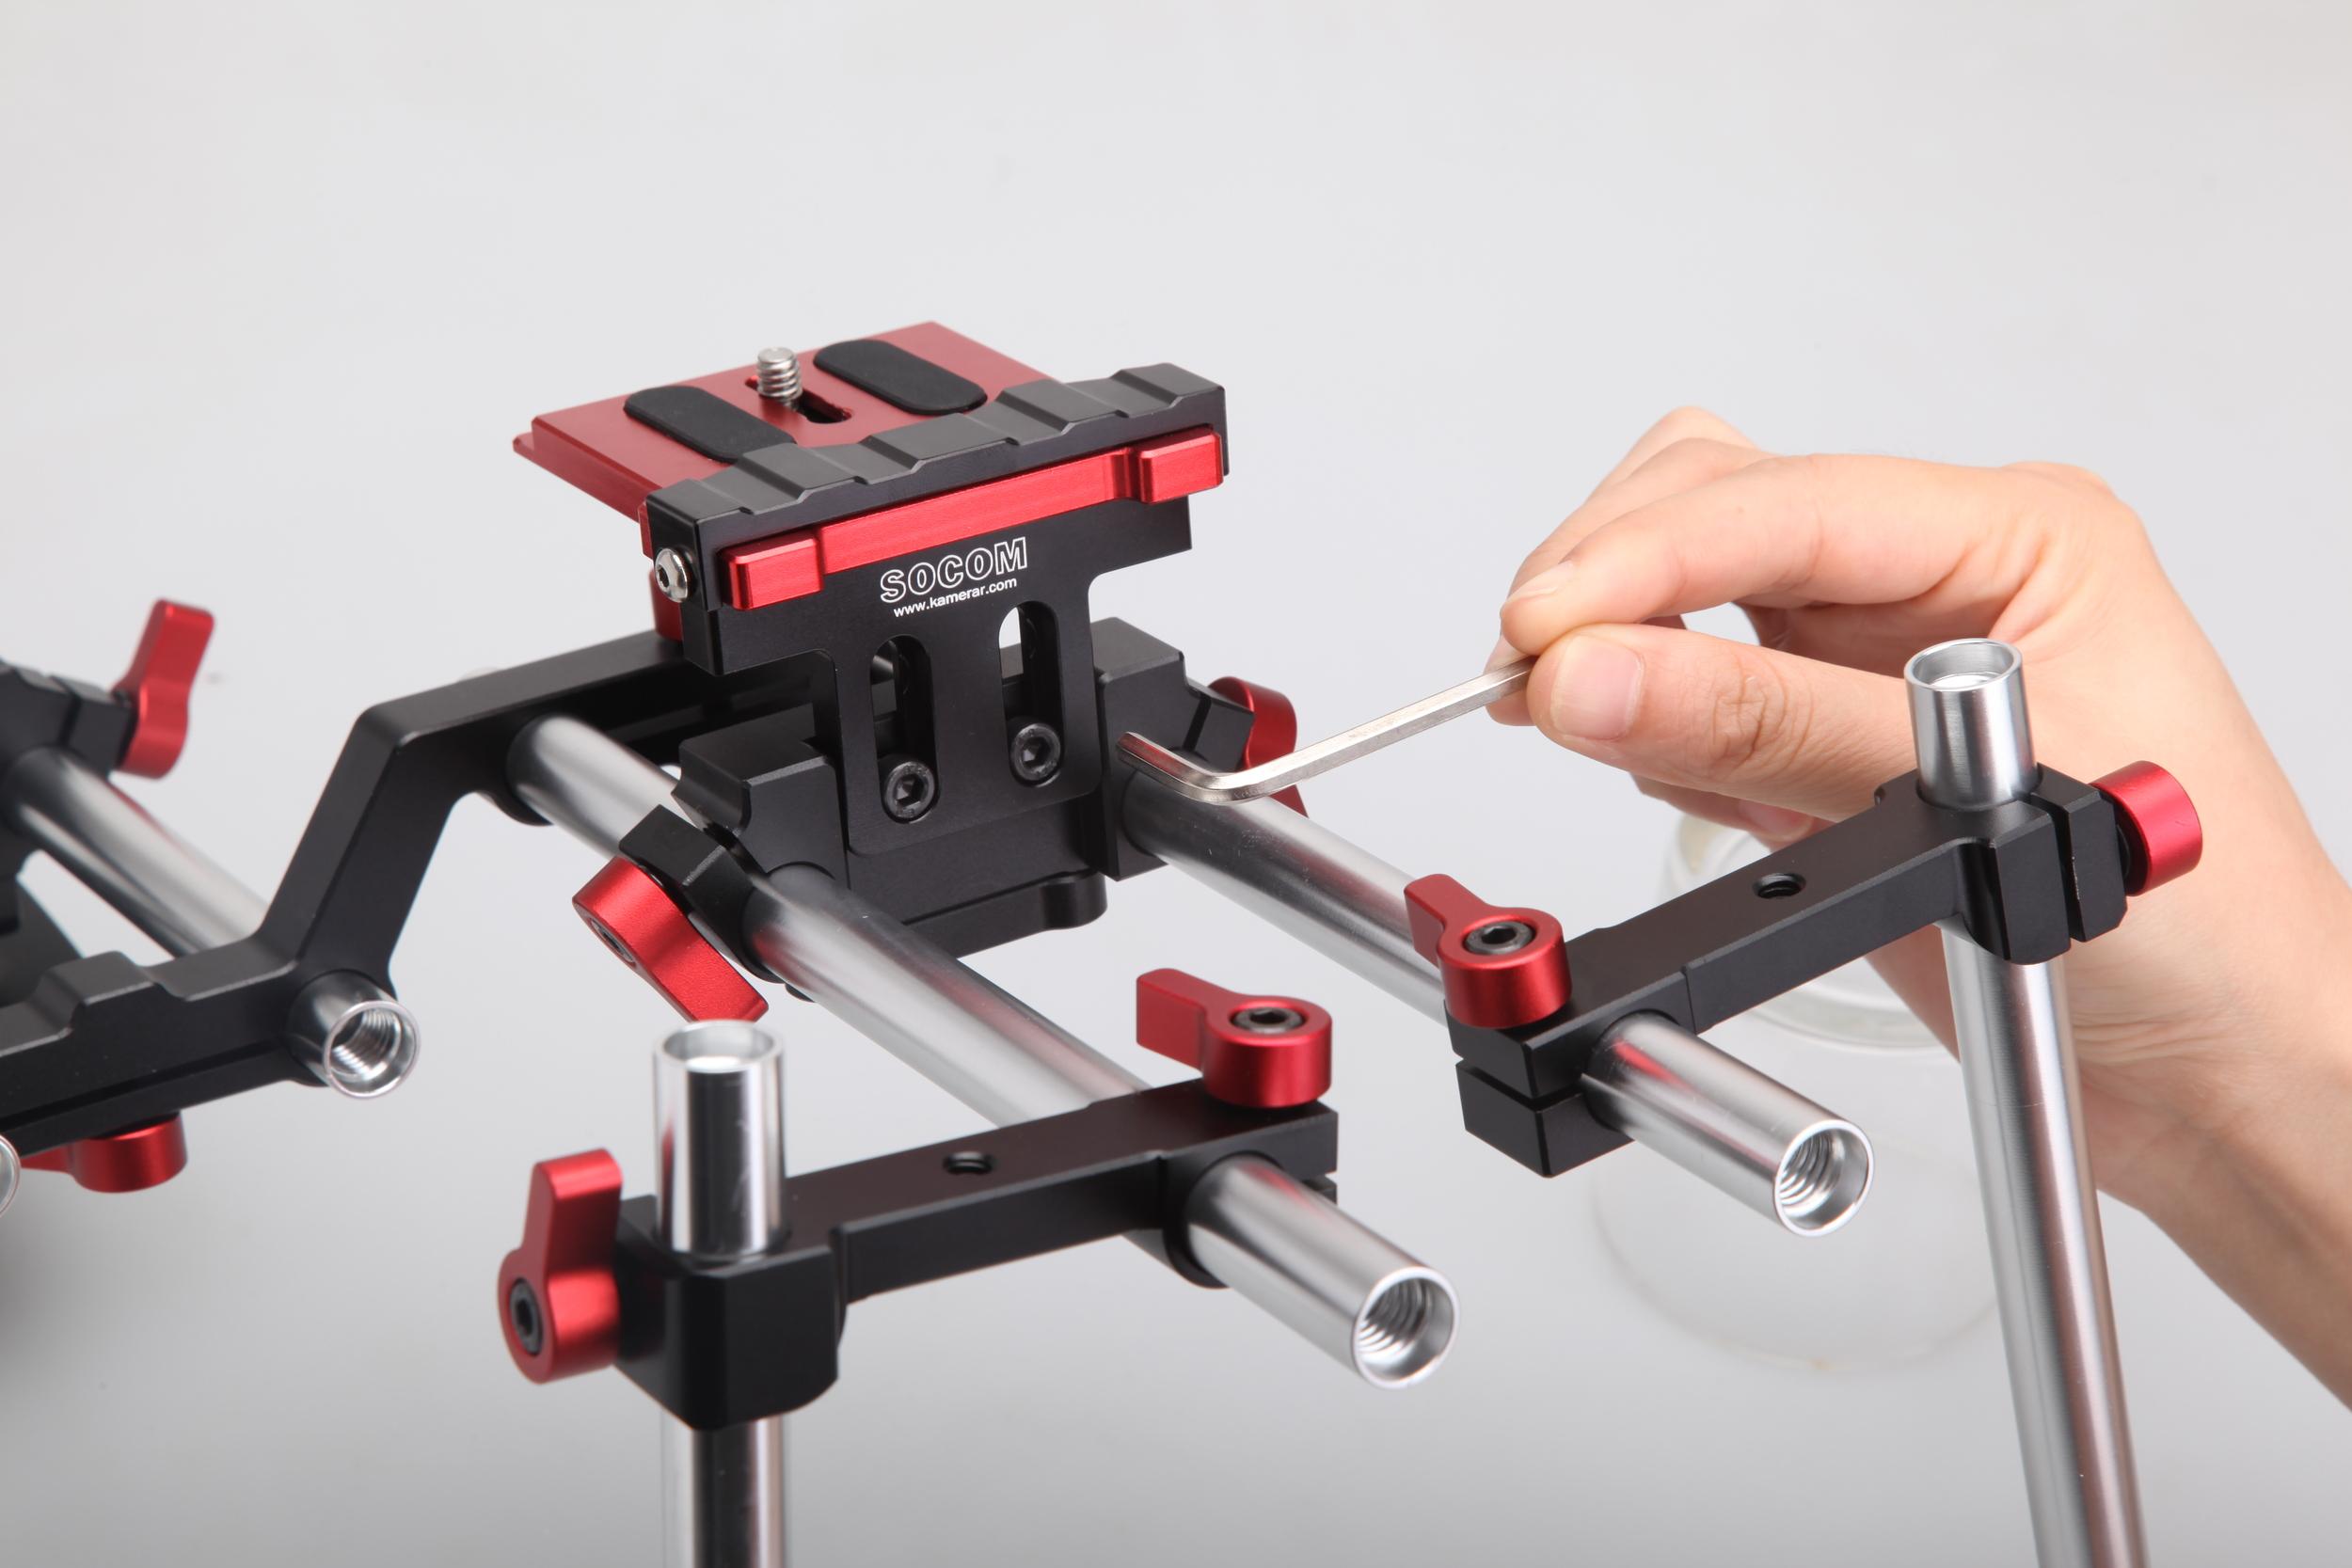 Kamerar Socom Shoulder Rig Adjustments.JPG